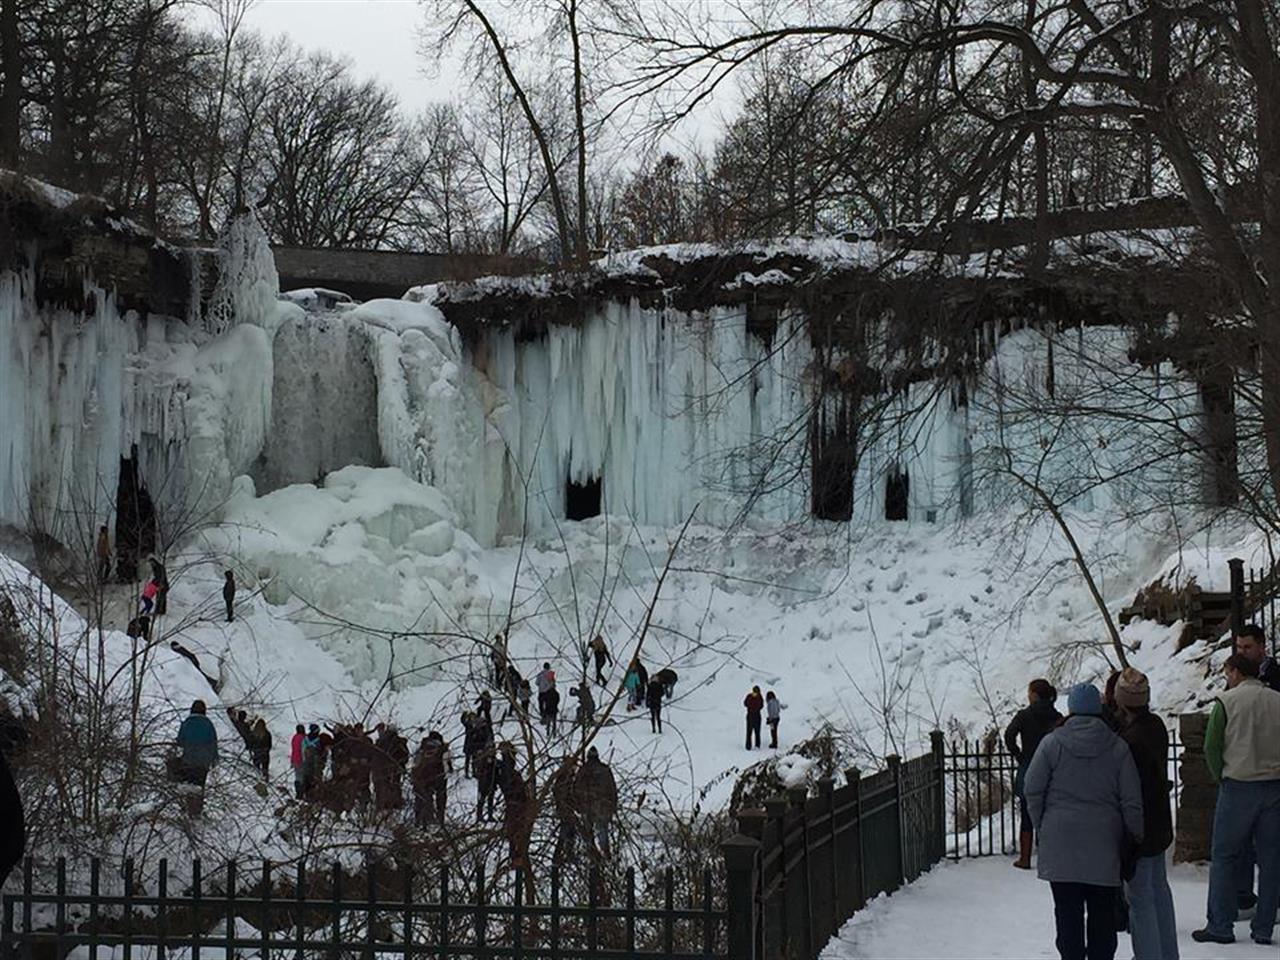 Frozen waterfall - it's like an ice castle  #Minnehaha #Minneapolis #LeadingRELocal #BairdWarner #Vacation